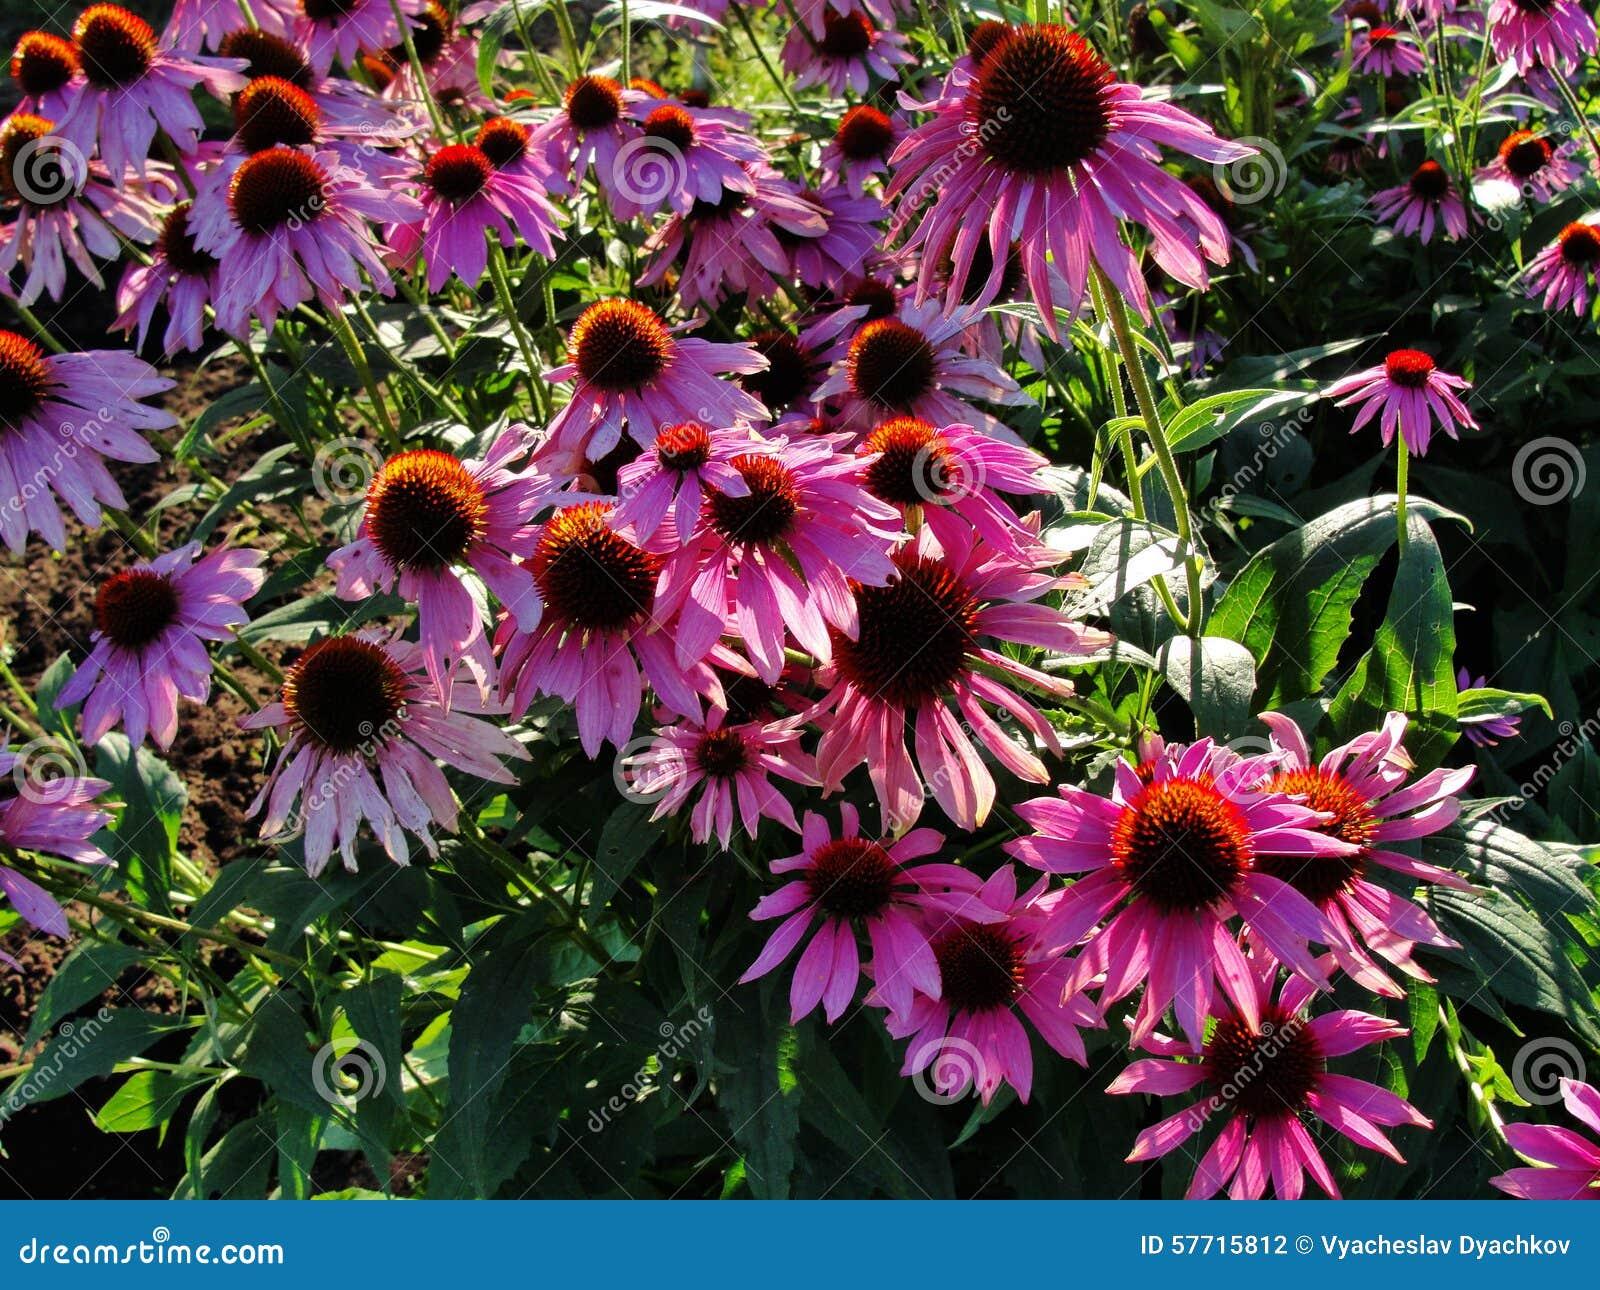 beautiful decorative flowers in the summer garden. large bush